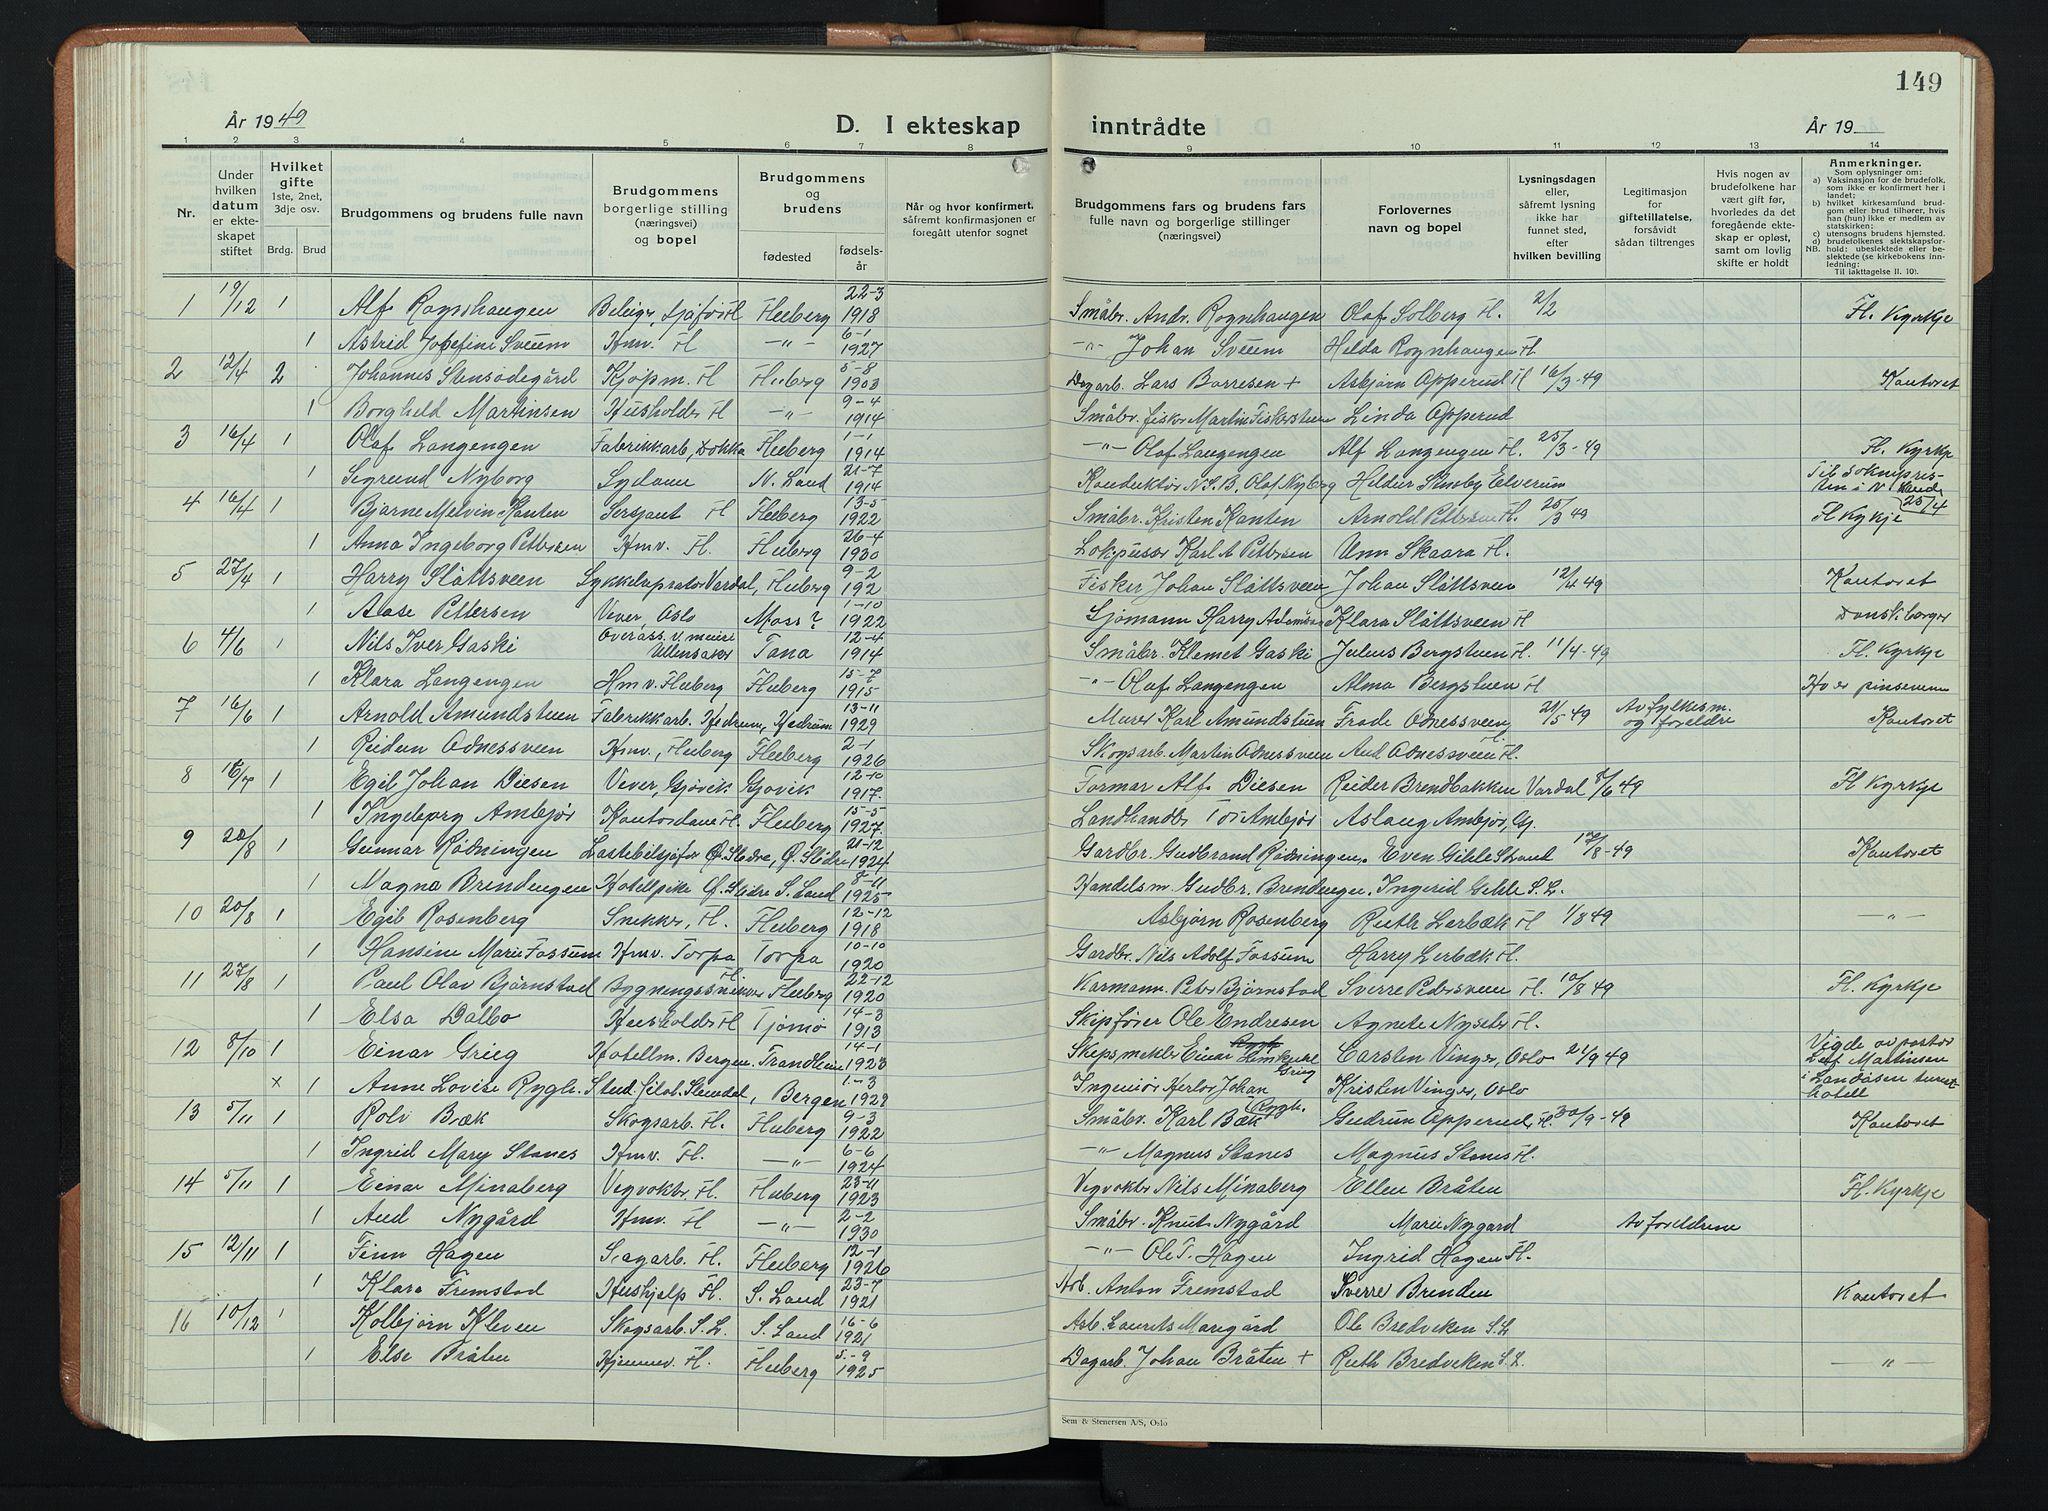 SAH, Søndre Land prestekontor, L/L0008: Klokkerbok nr. 8, 1926-1950, s. 149